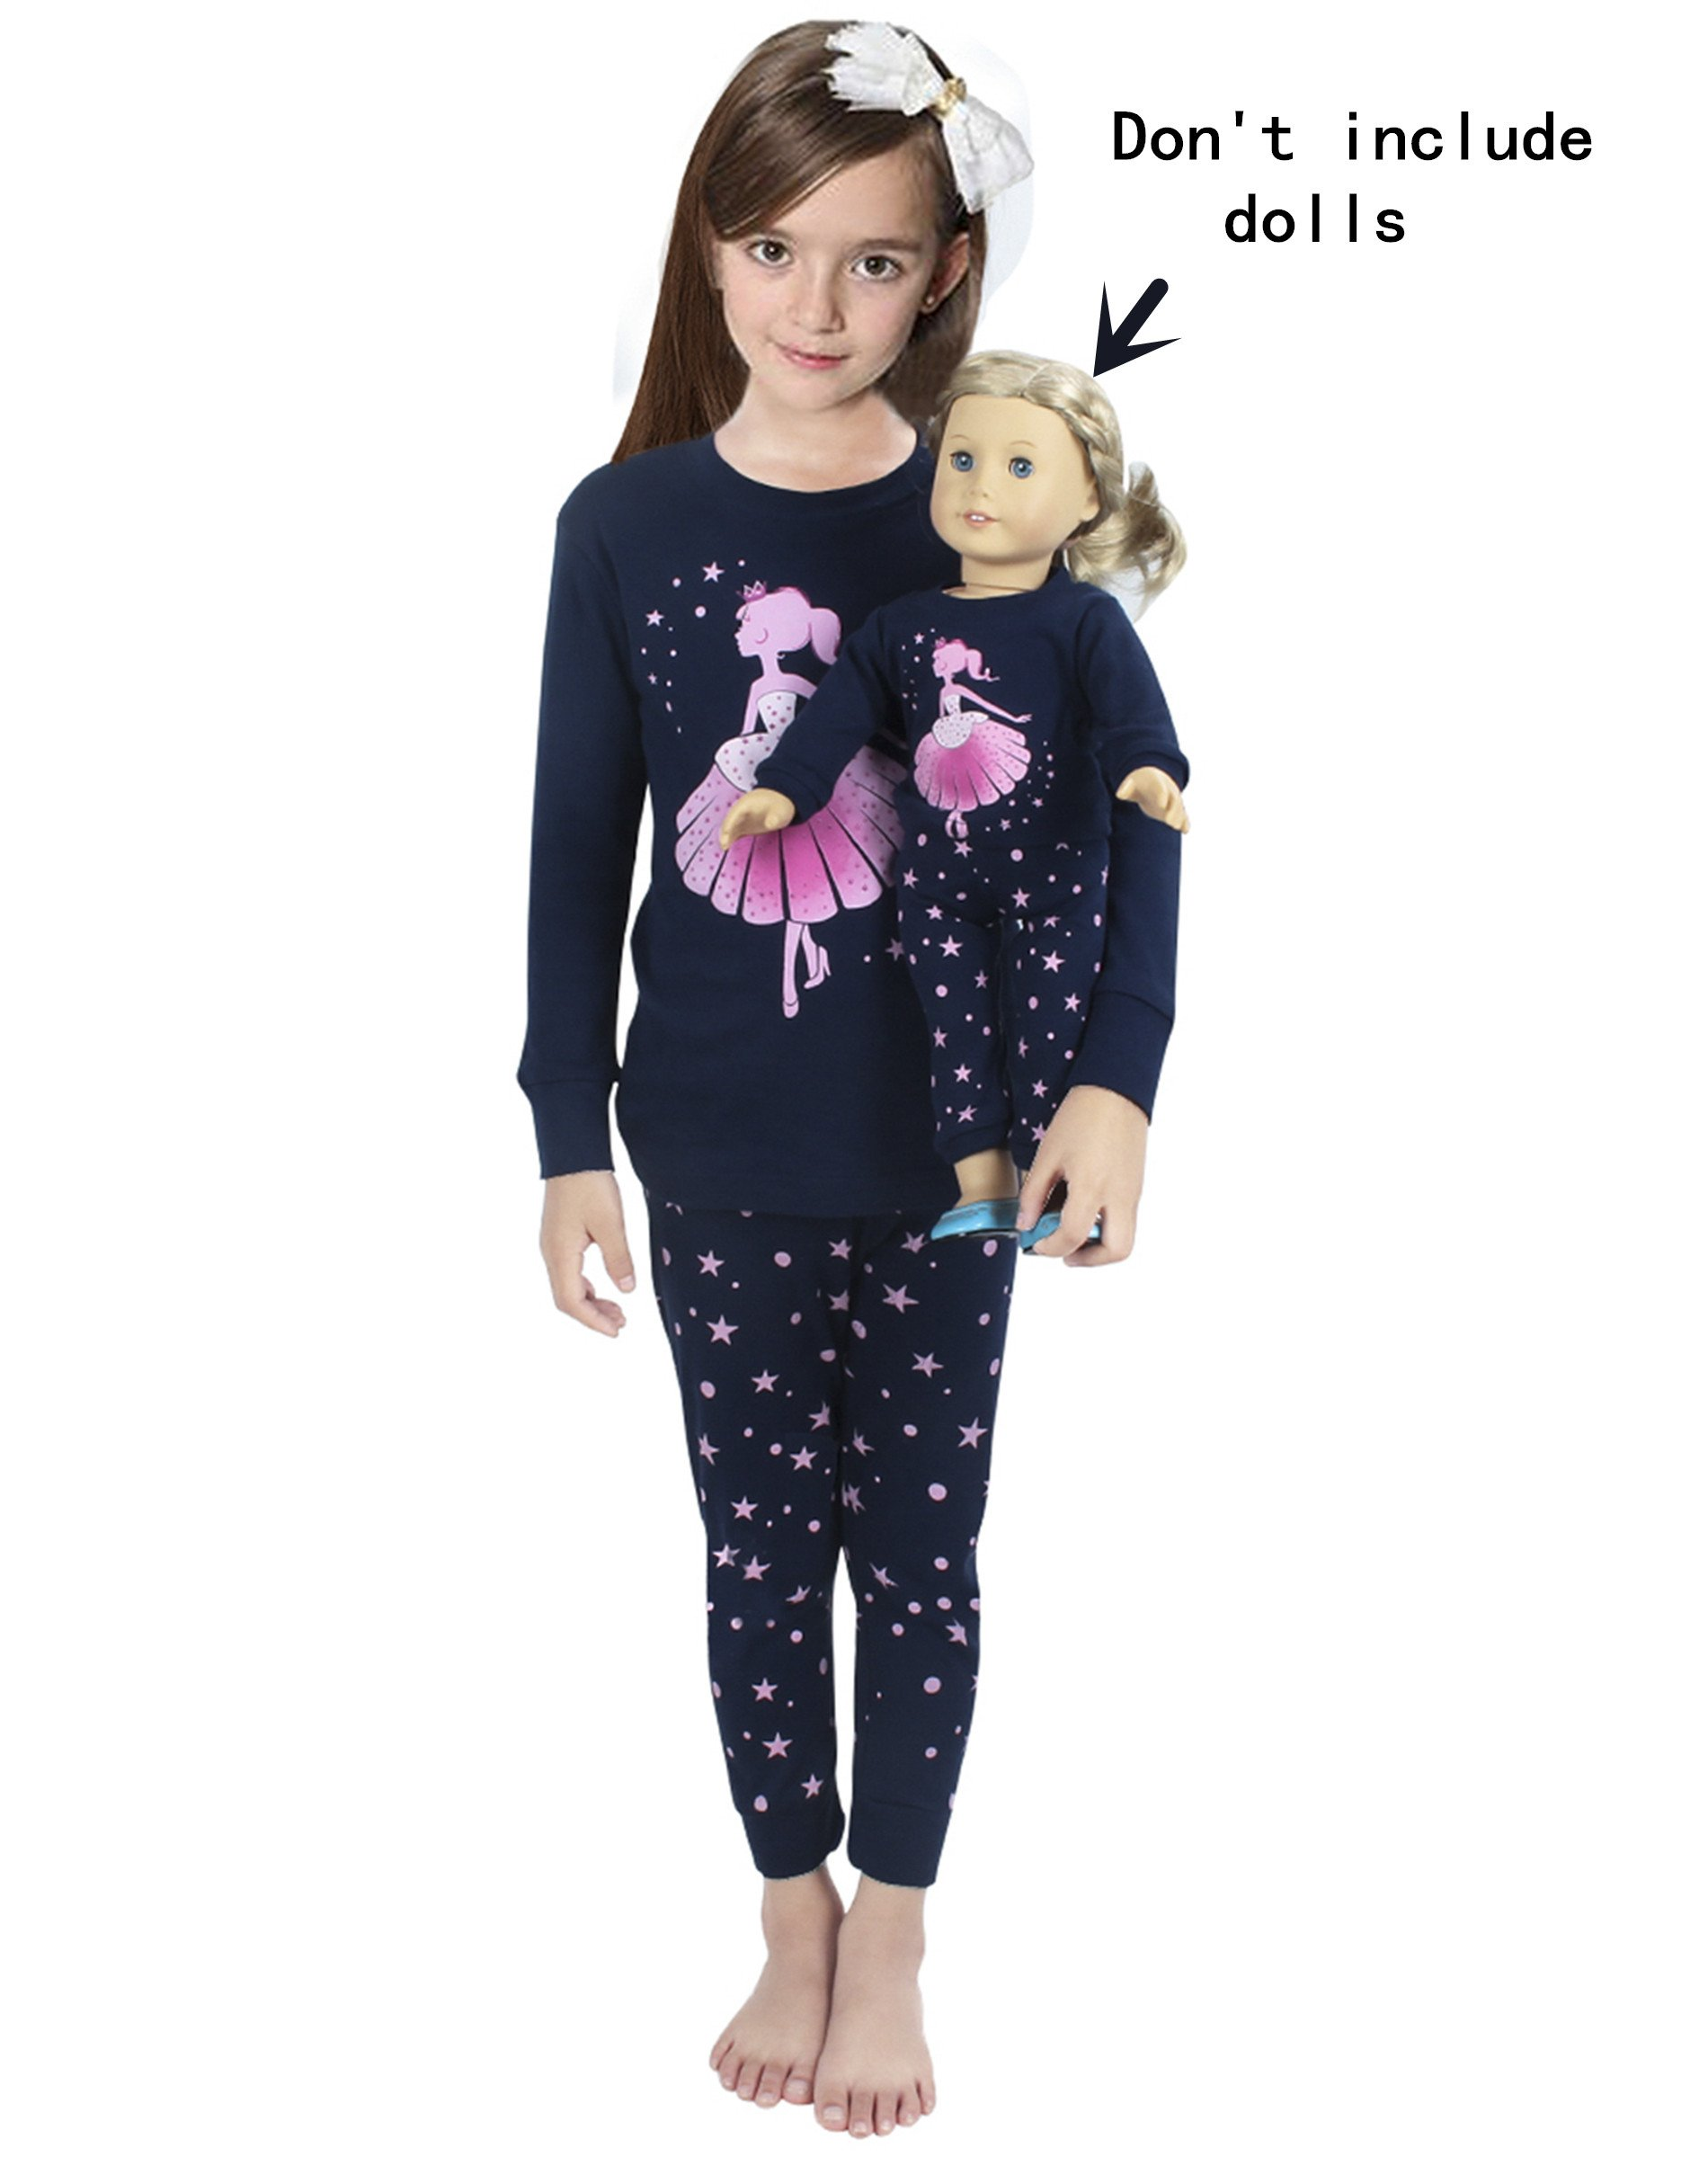 Girls Matching Doll&Toddler Dance 4 Piece Cotton Pajamas Kids Clothes Sleepwear Size 8